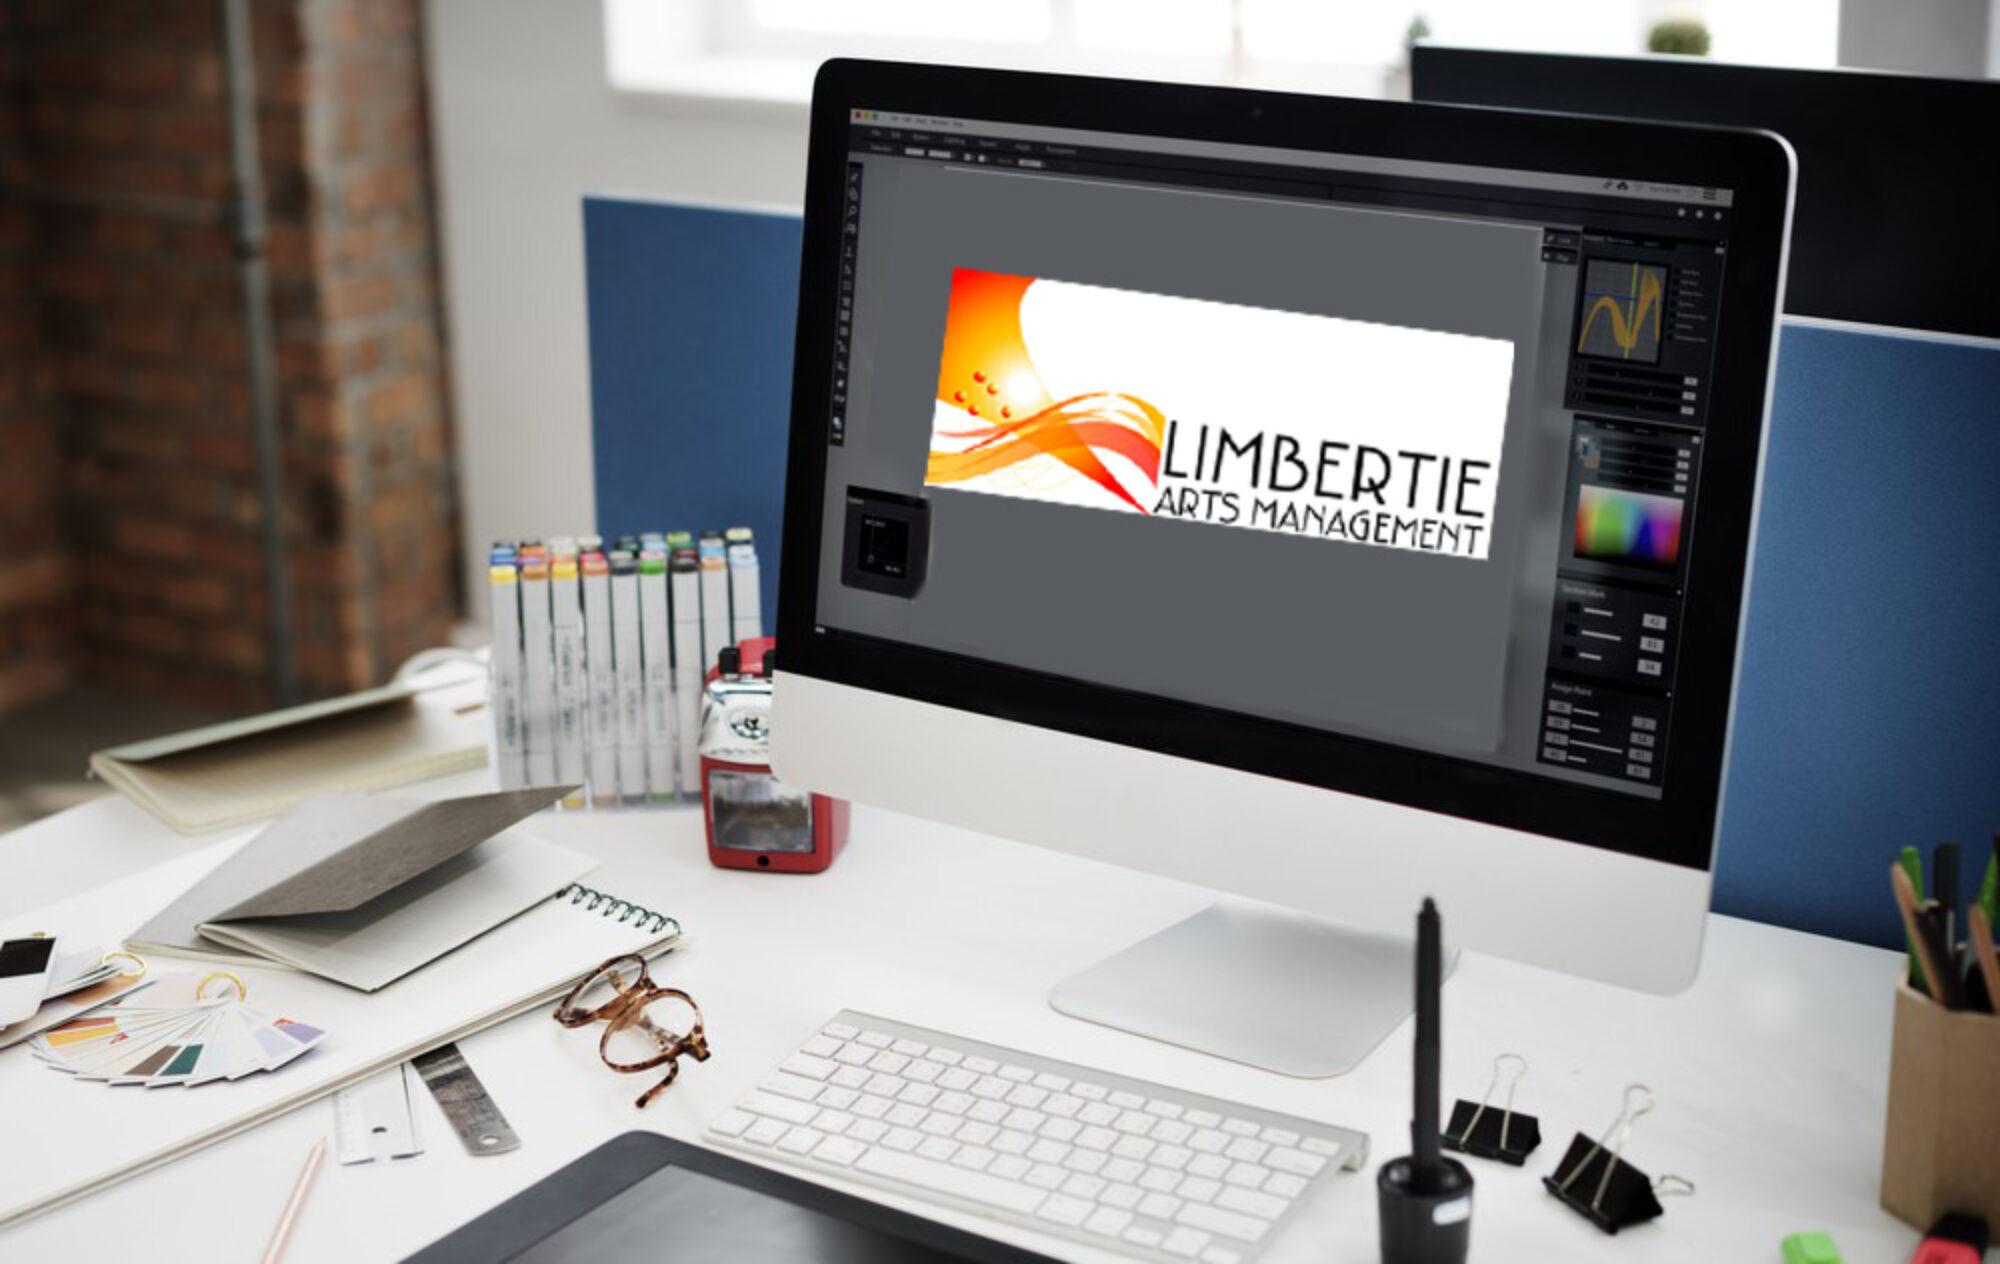 Limbertie Arts Management